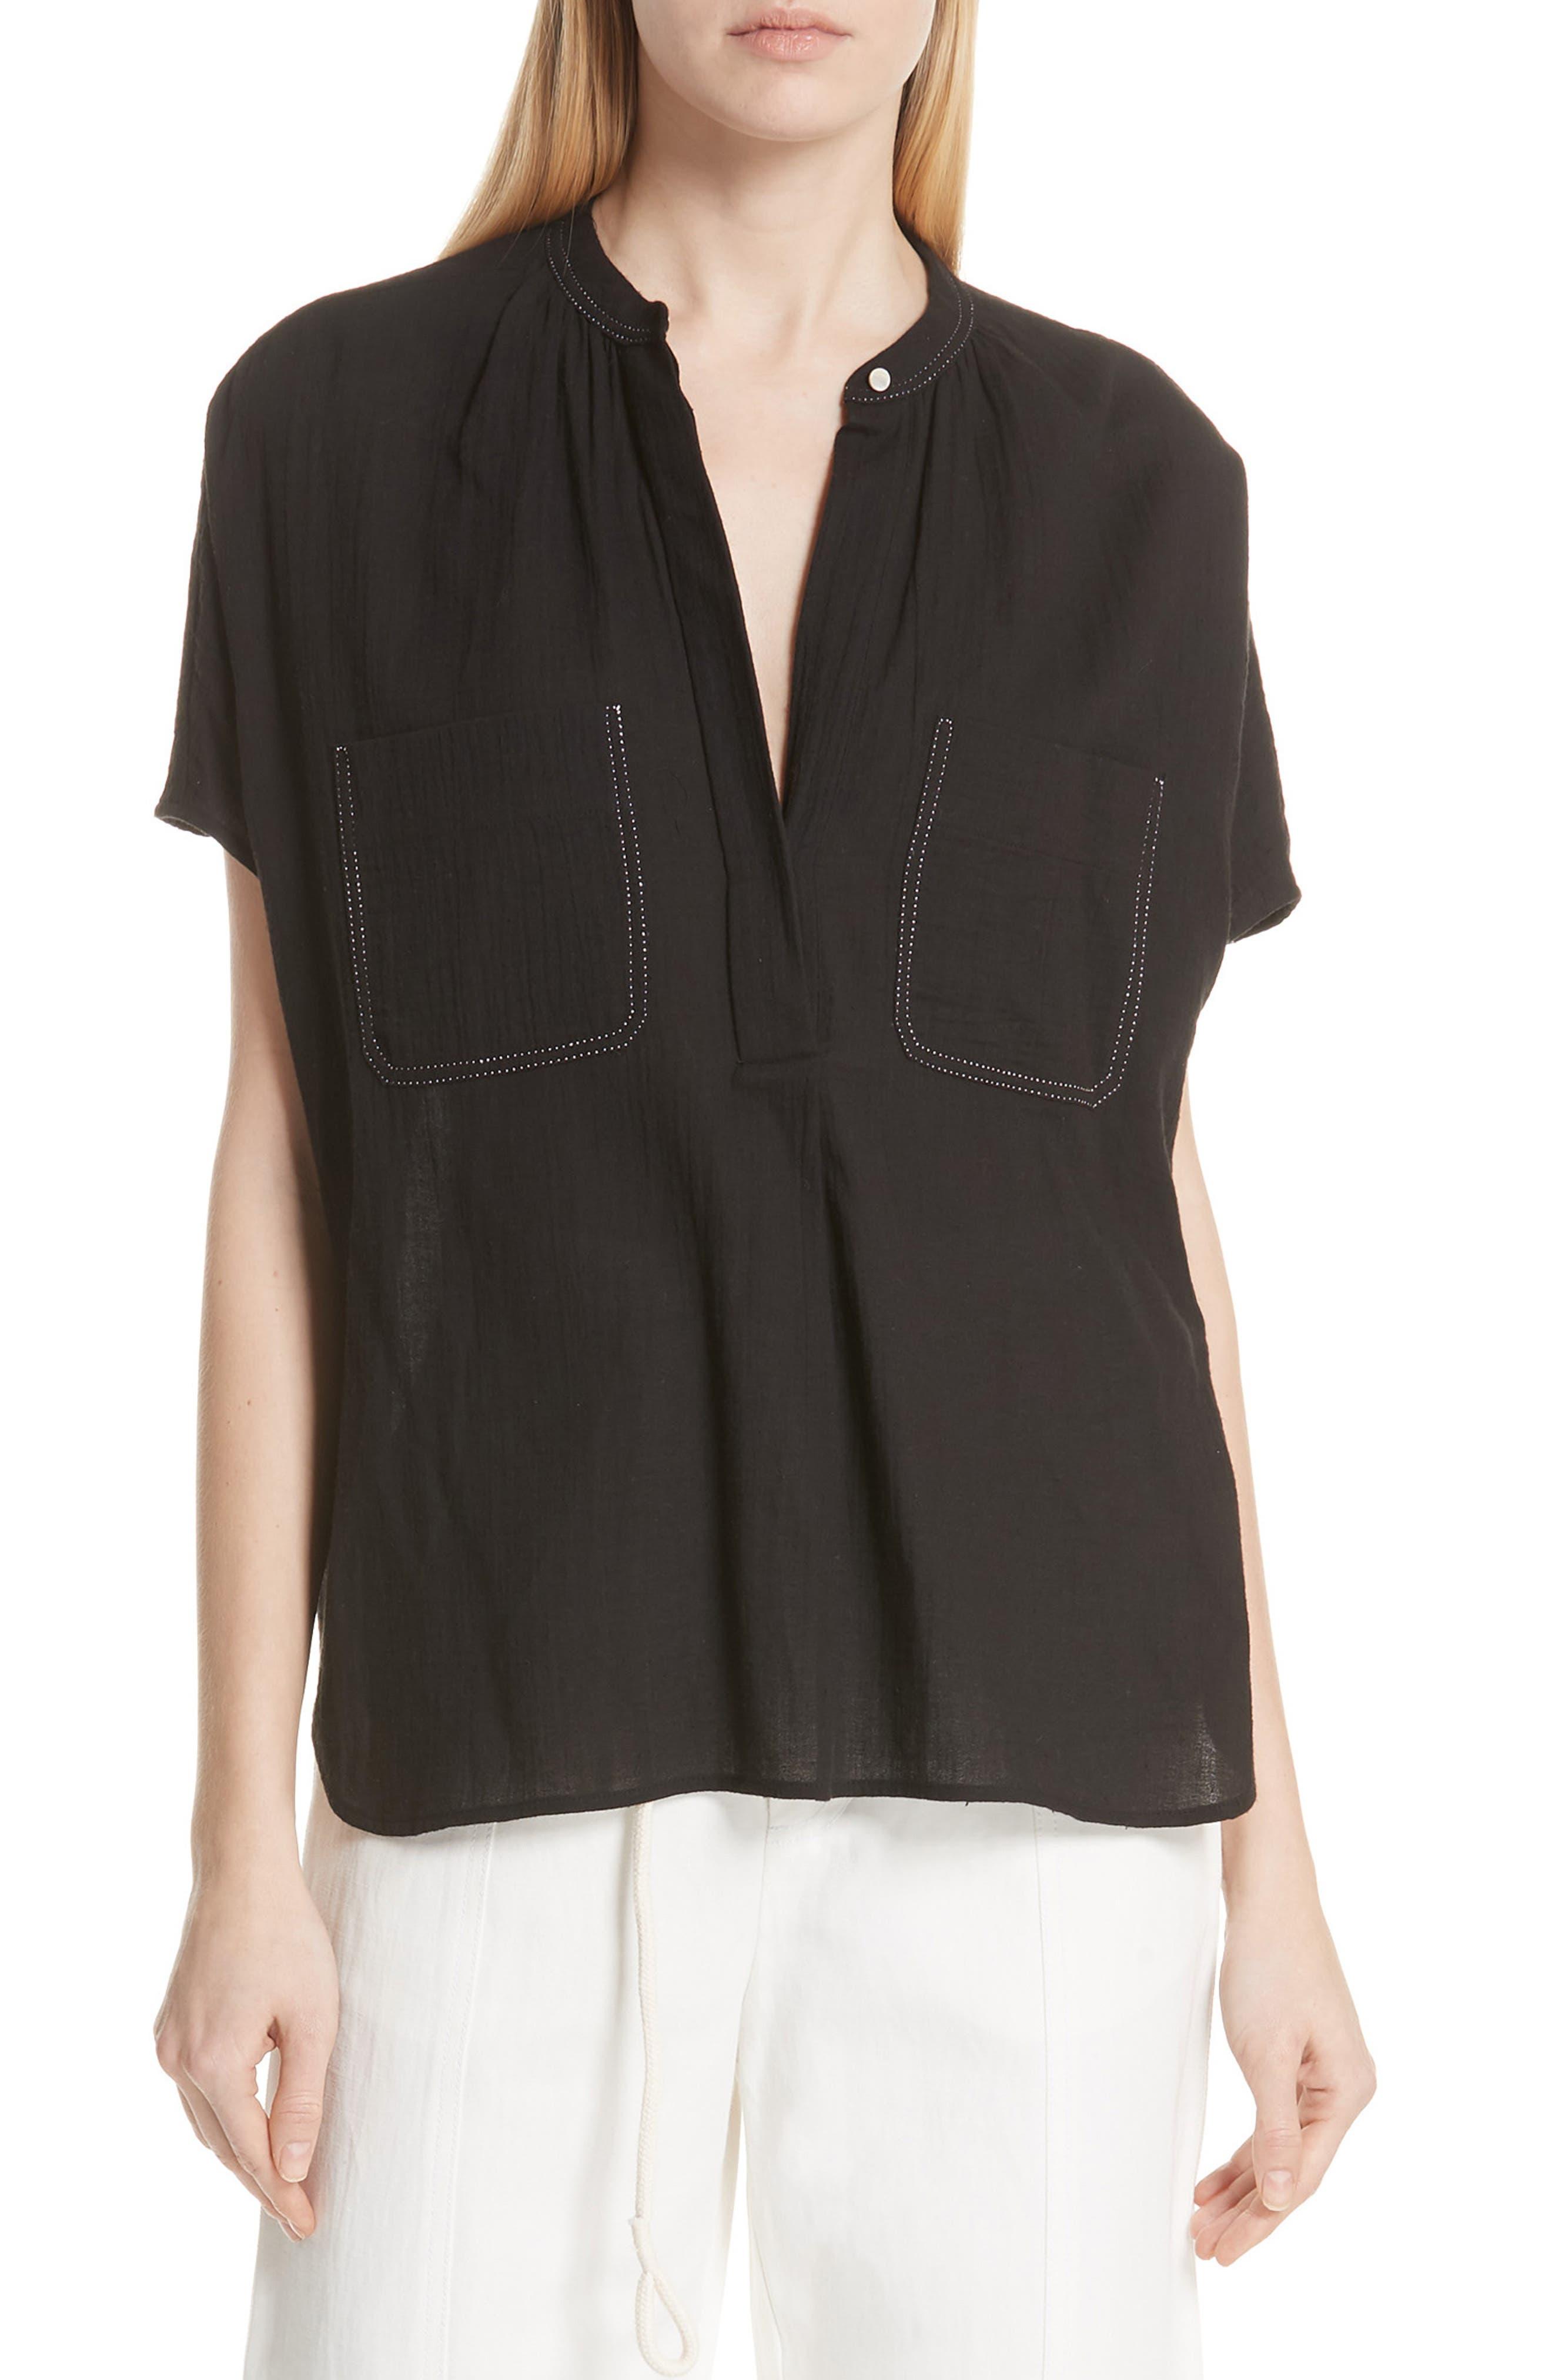 Topstitch Crinkle Cotton Top,                         Main,                         color,